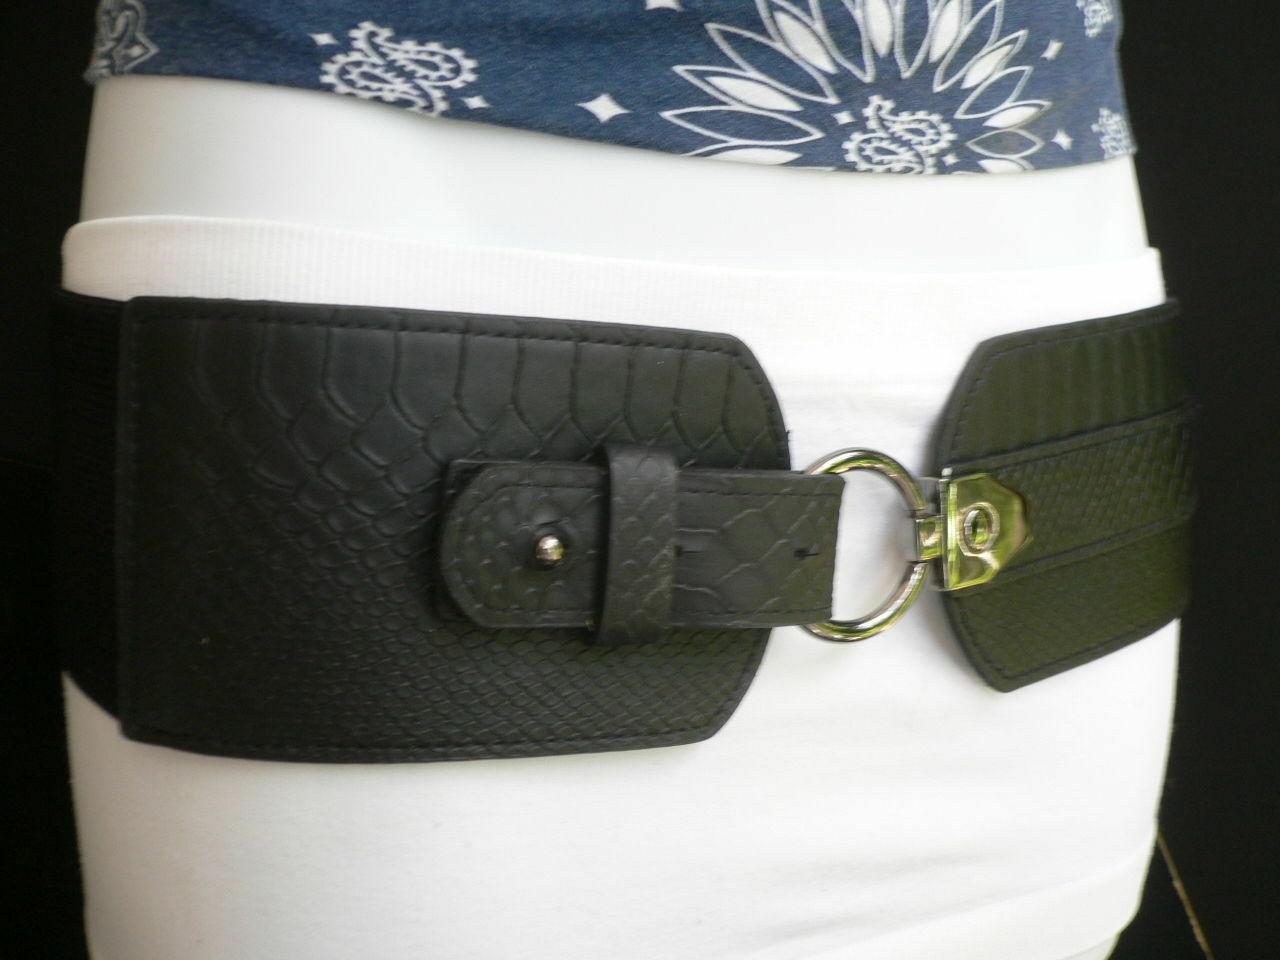 Cintura Donna Fashion Hip Vita Elastico Nero Largo Finta pelle Serpente Timbro